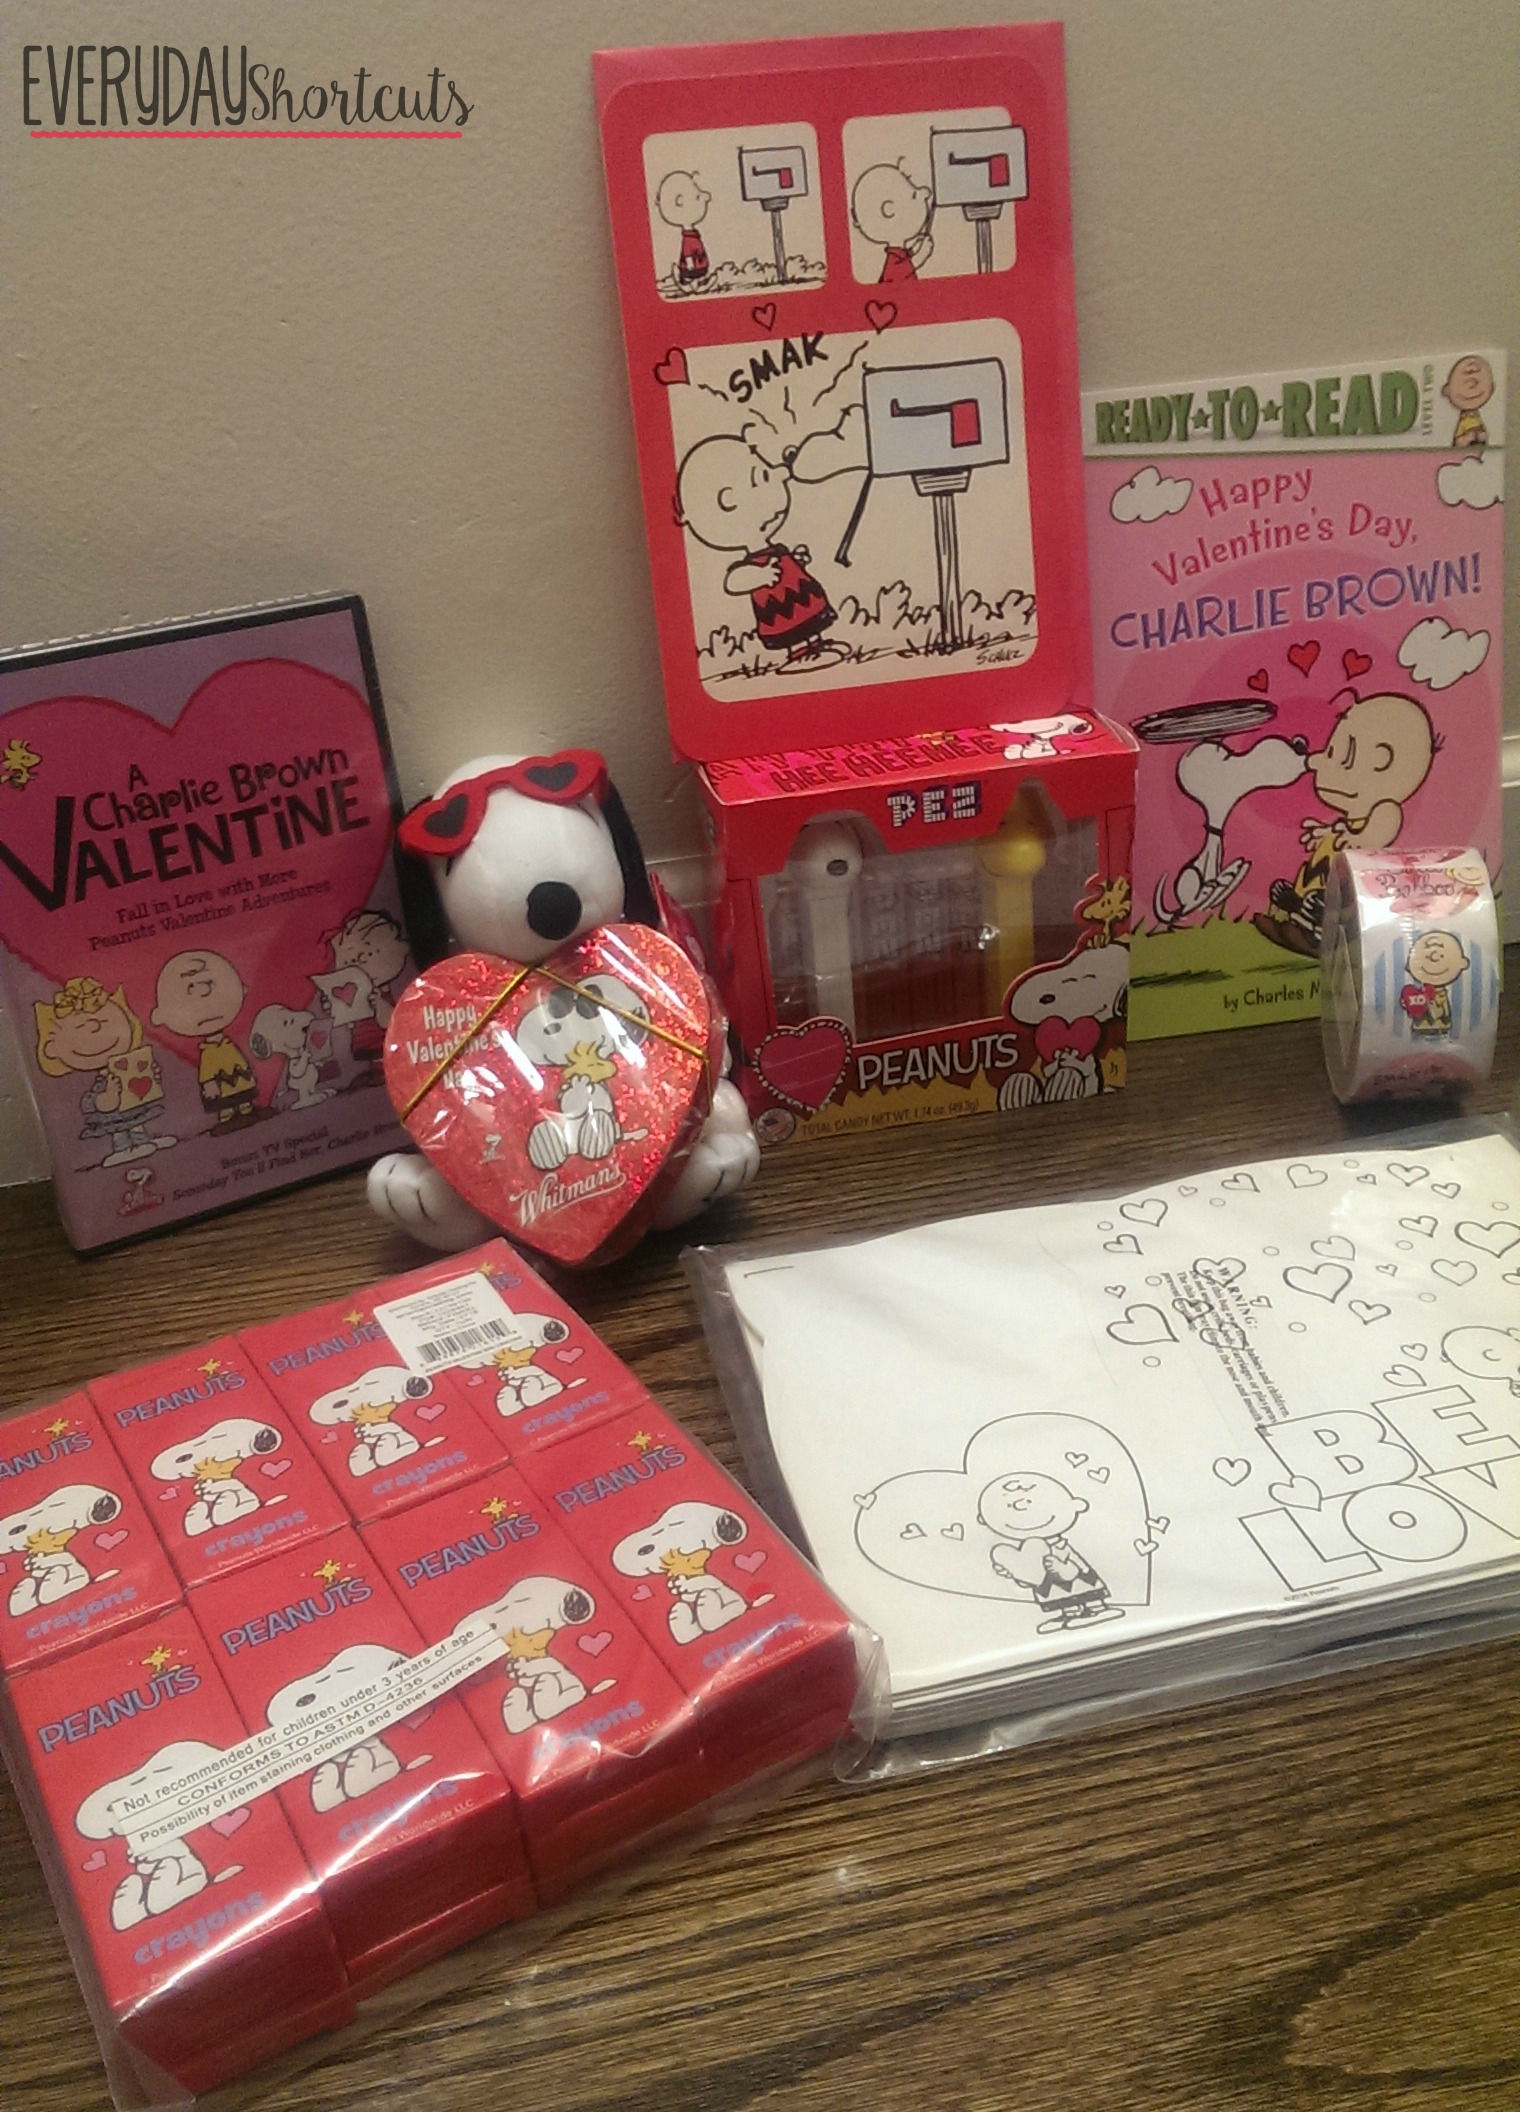 peanuts valentine's day goodies